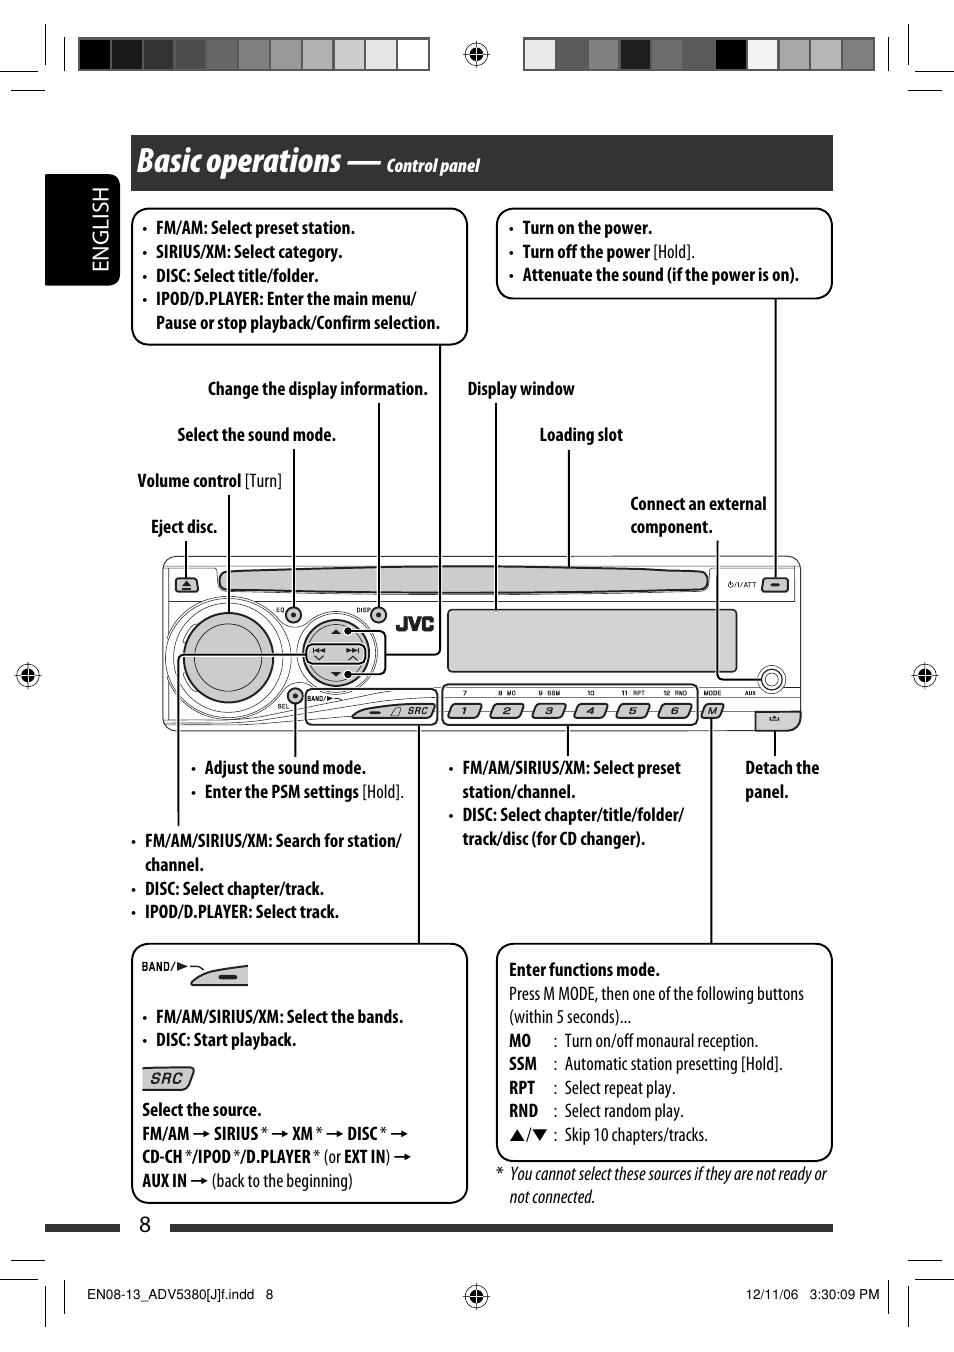 Basic operations — control panel, Basic operations